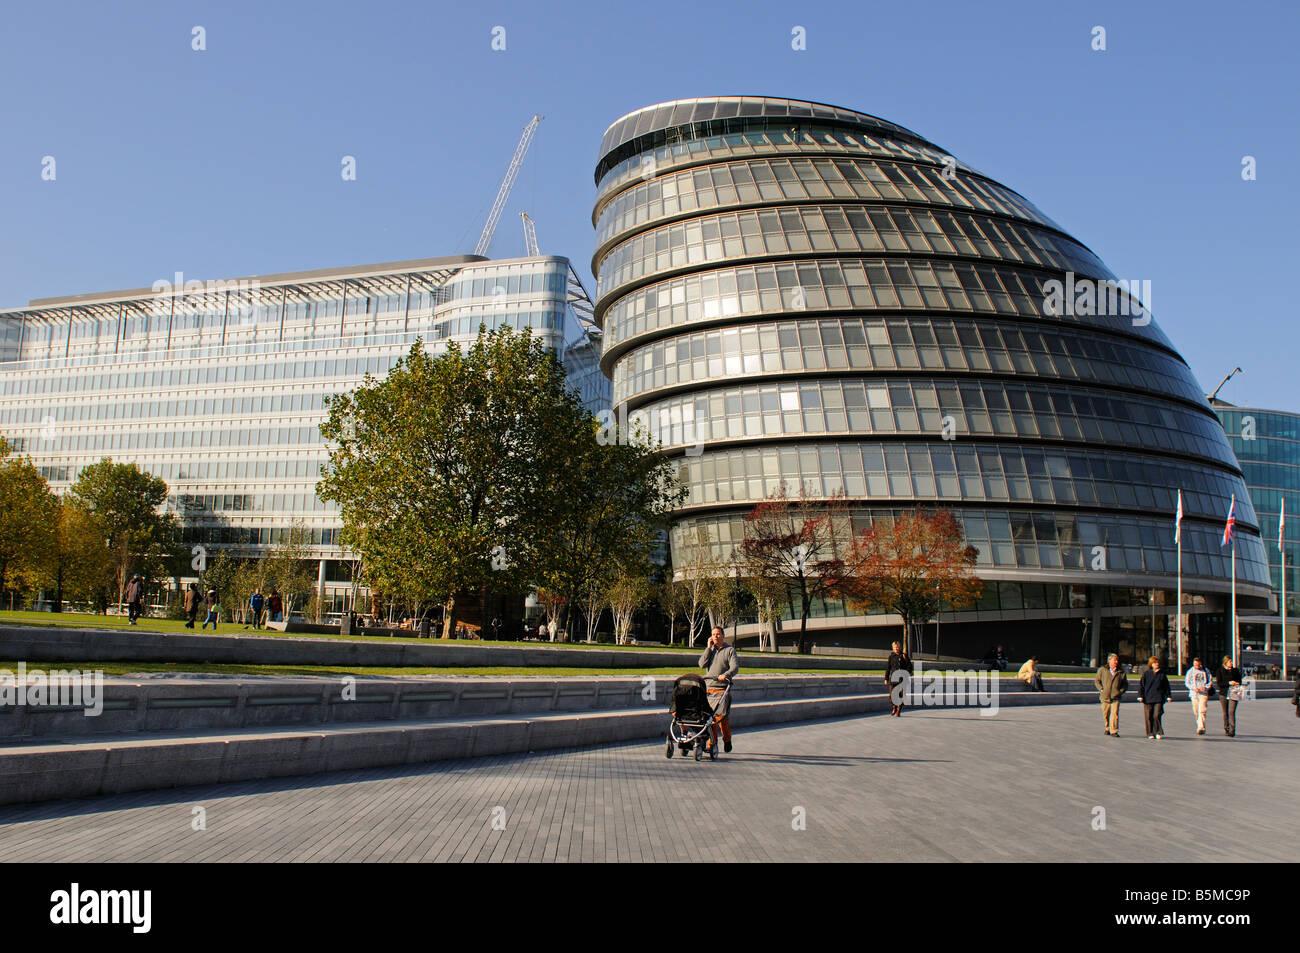 London Assembly Building Greater London Authority GLA London UK - Stock Image